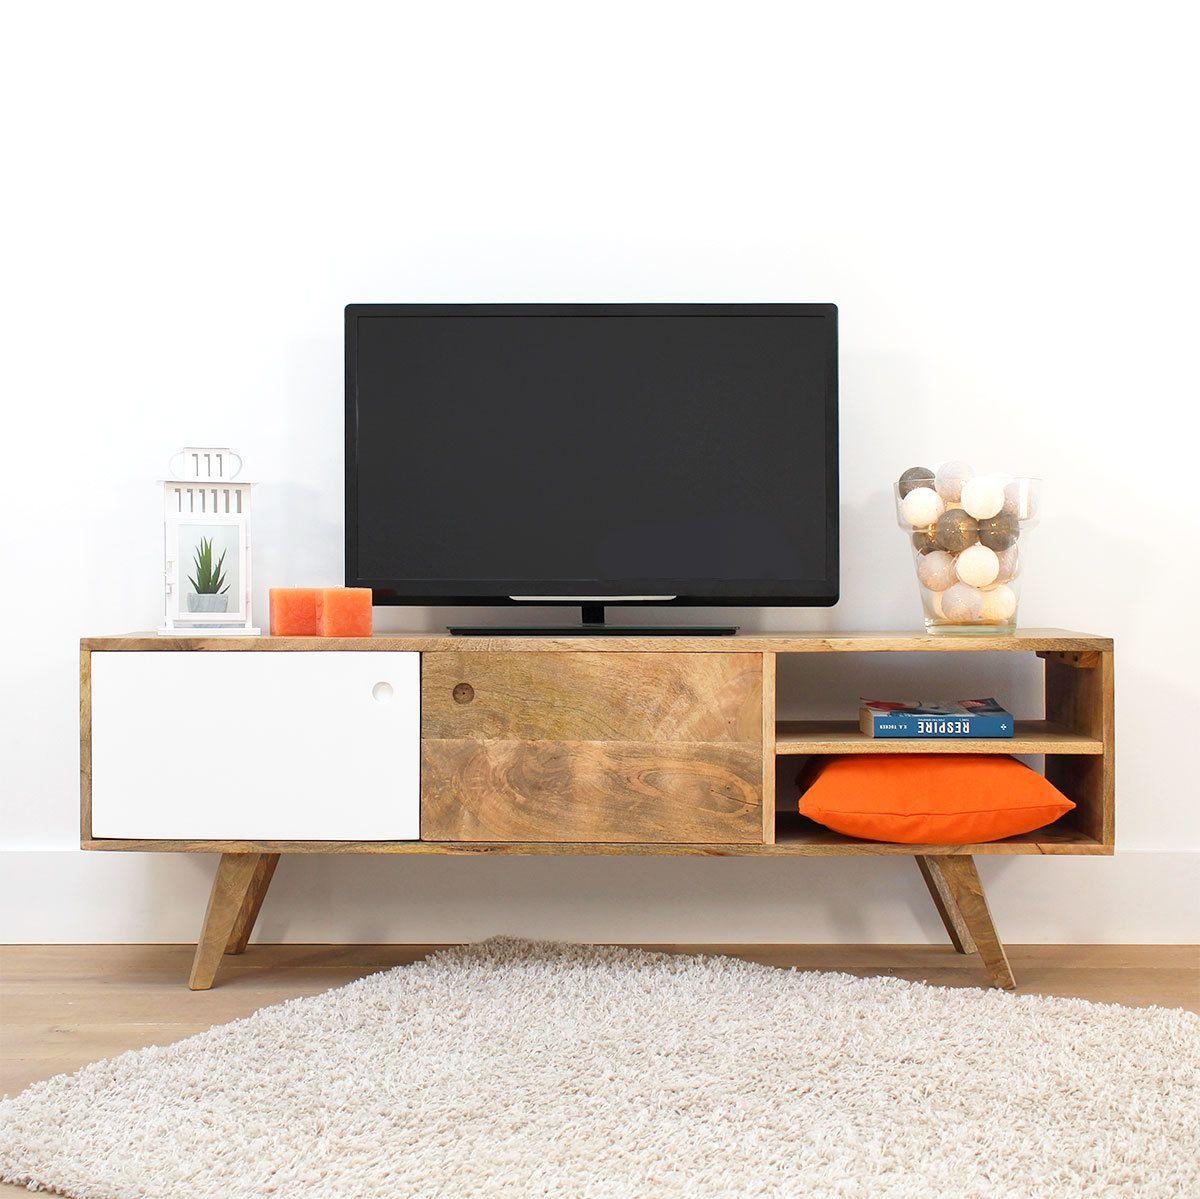 Meuble Tv Scandinave En Bois Artiq Style Scandinave Meuble Tv  # Style Scandinave Meuble Tele